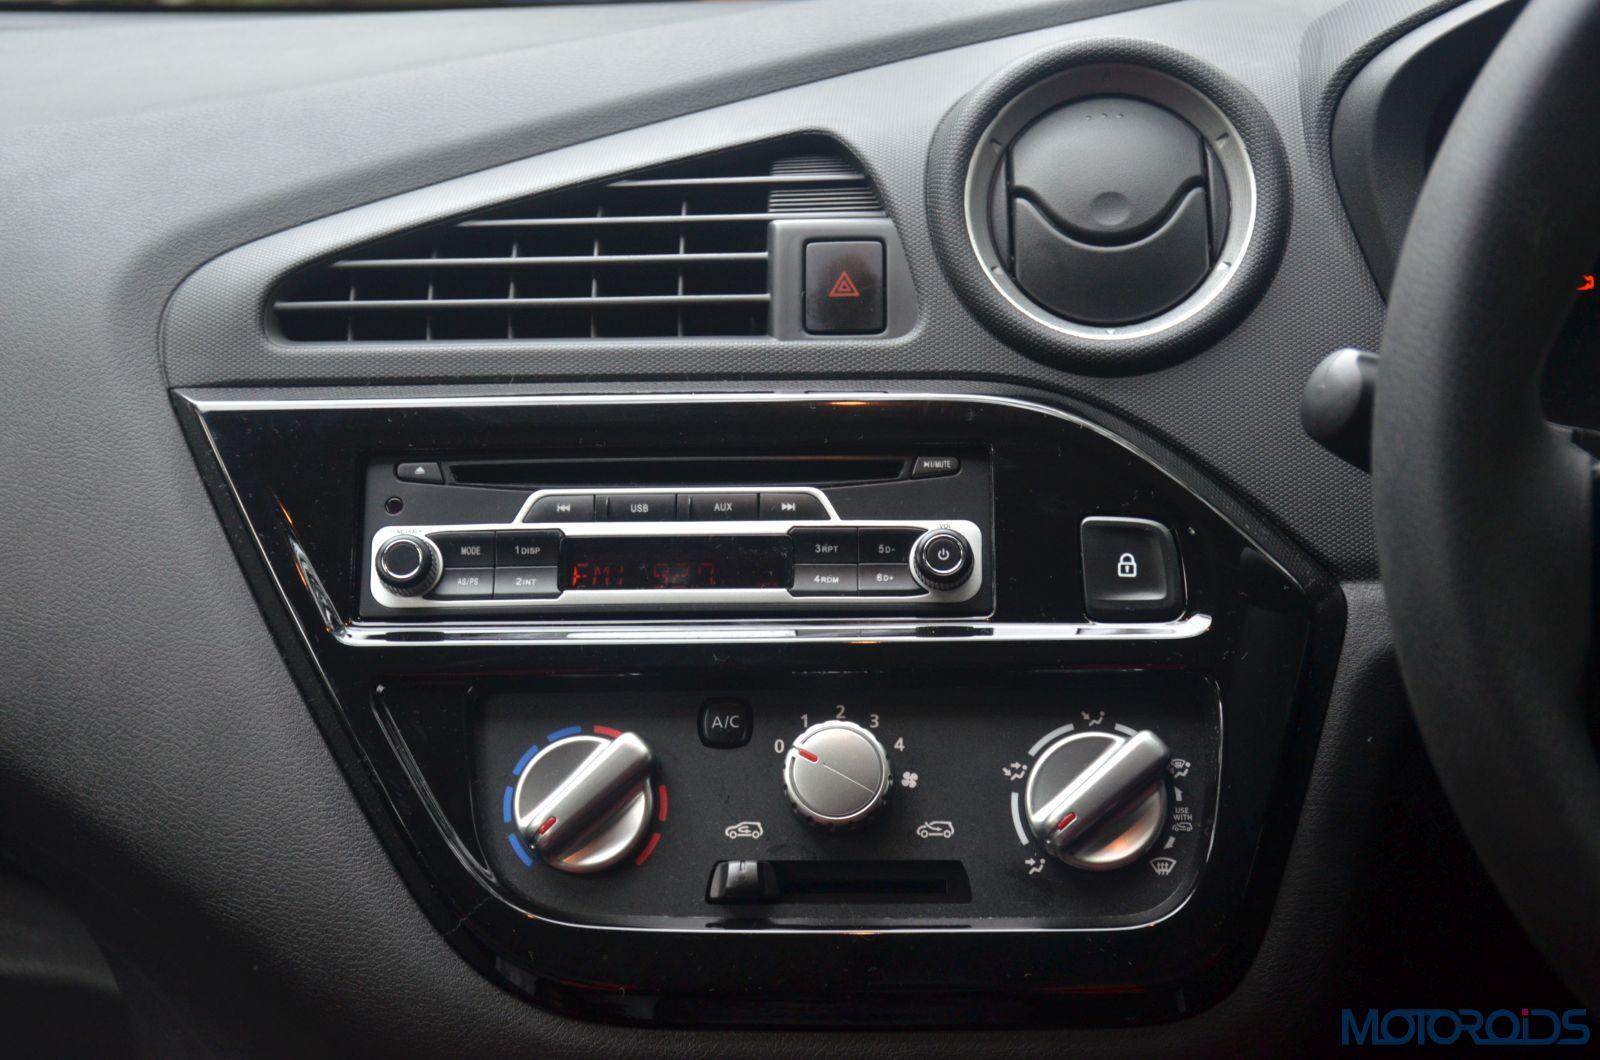 July 13, 2017-New-Datsun-redi-GO-1.0-Review-36.jpg